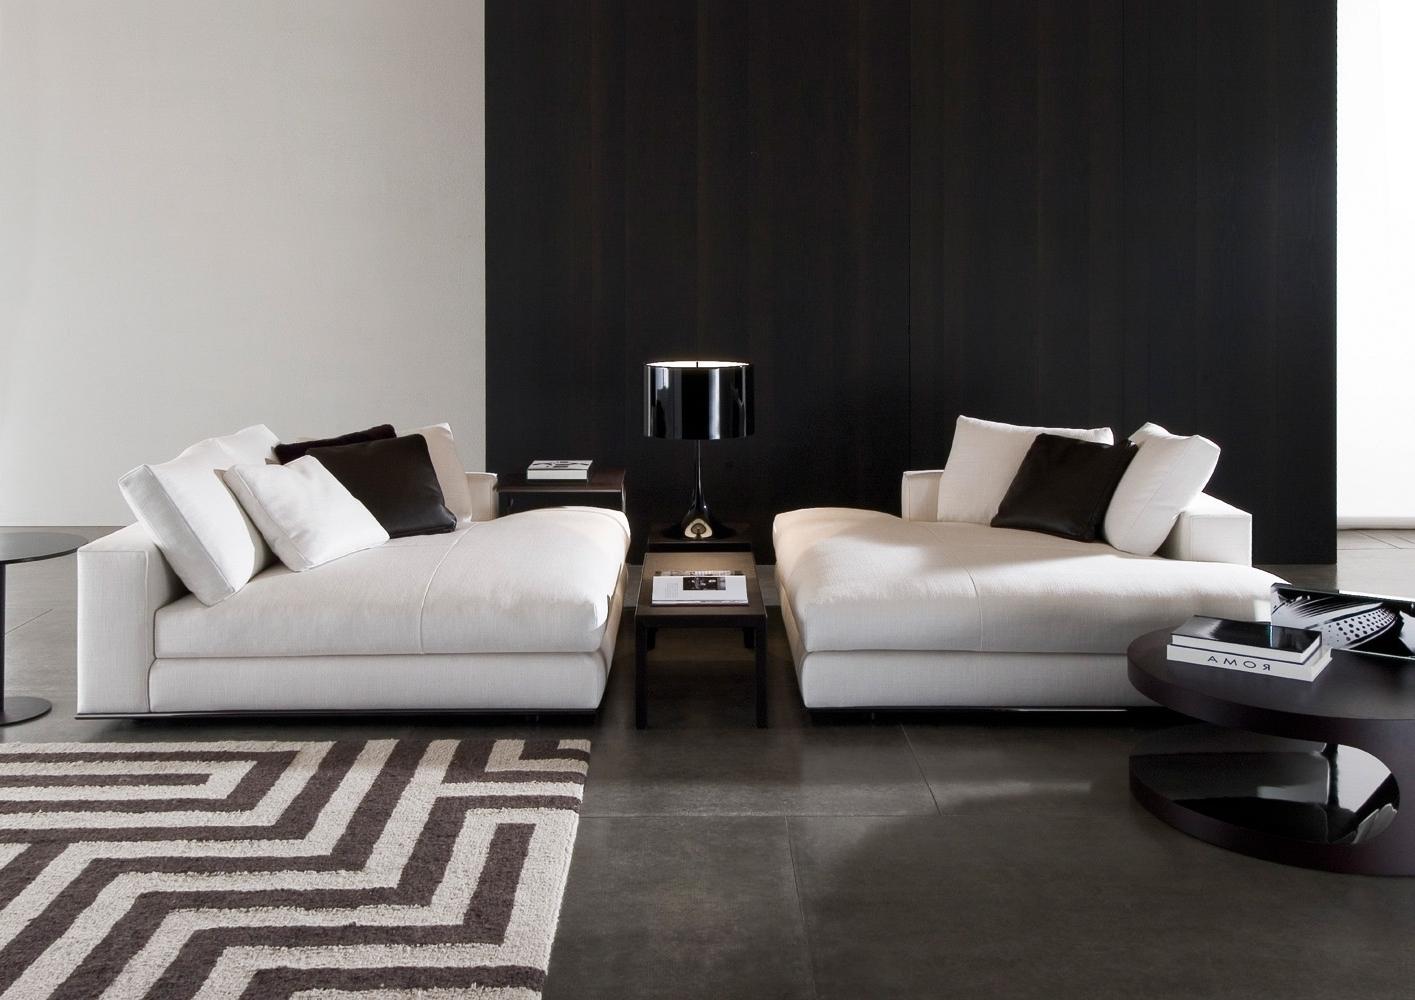 Modular Sofa Hamilton Sofa, Minotti – Luxury Furniture Mr For Well Known Hamilton Sectional Sofas (View 12 of 20)